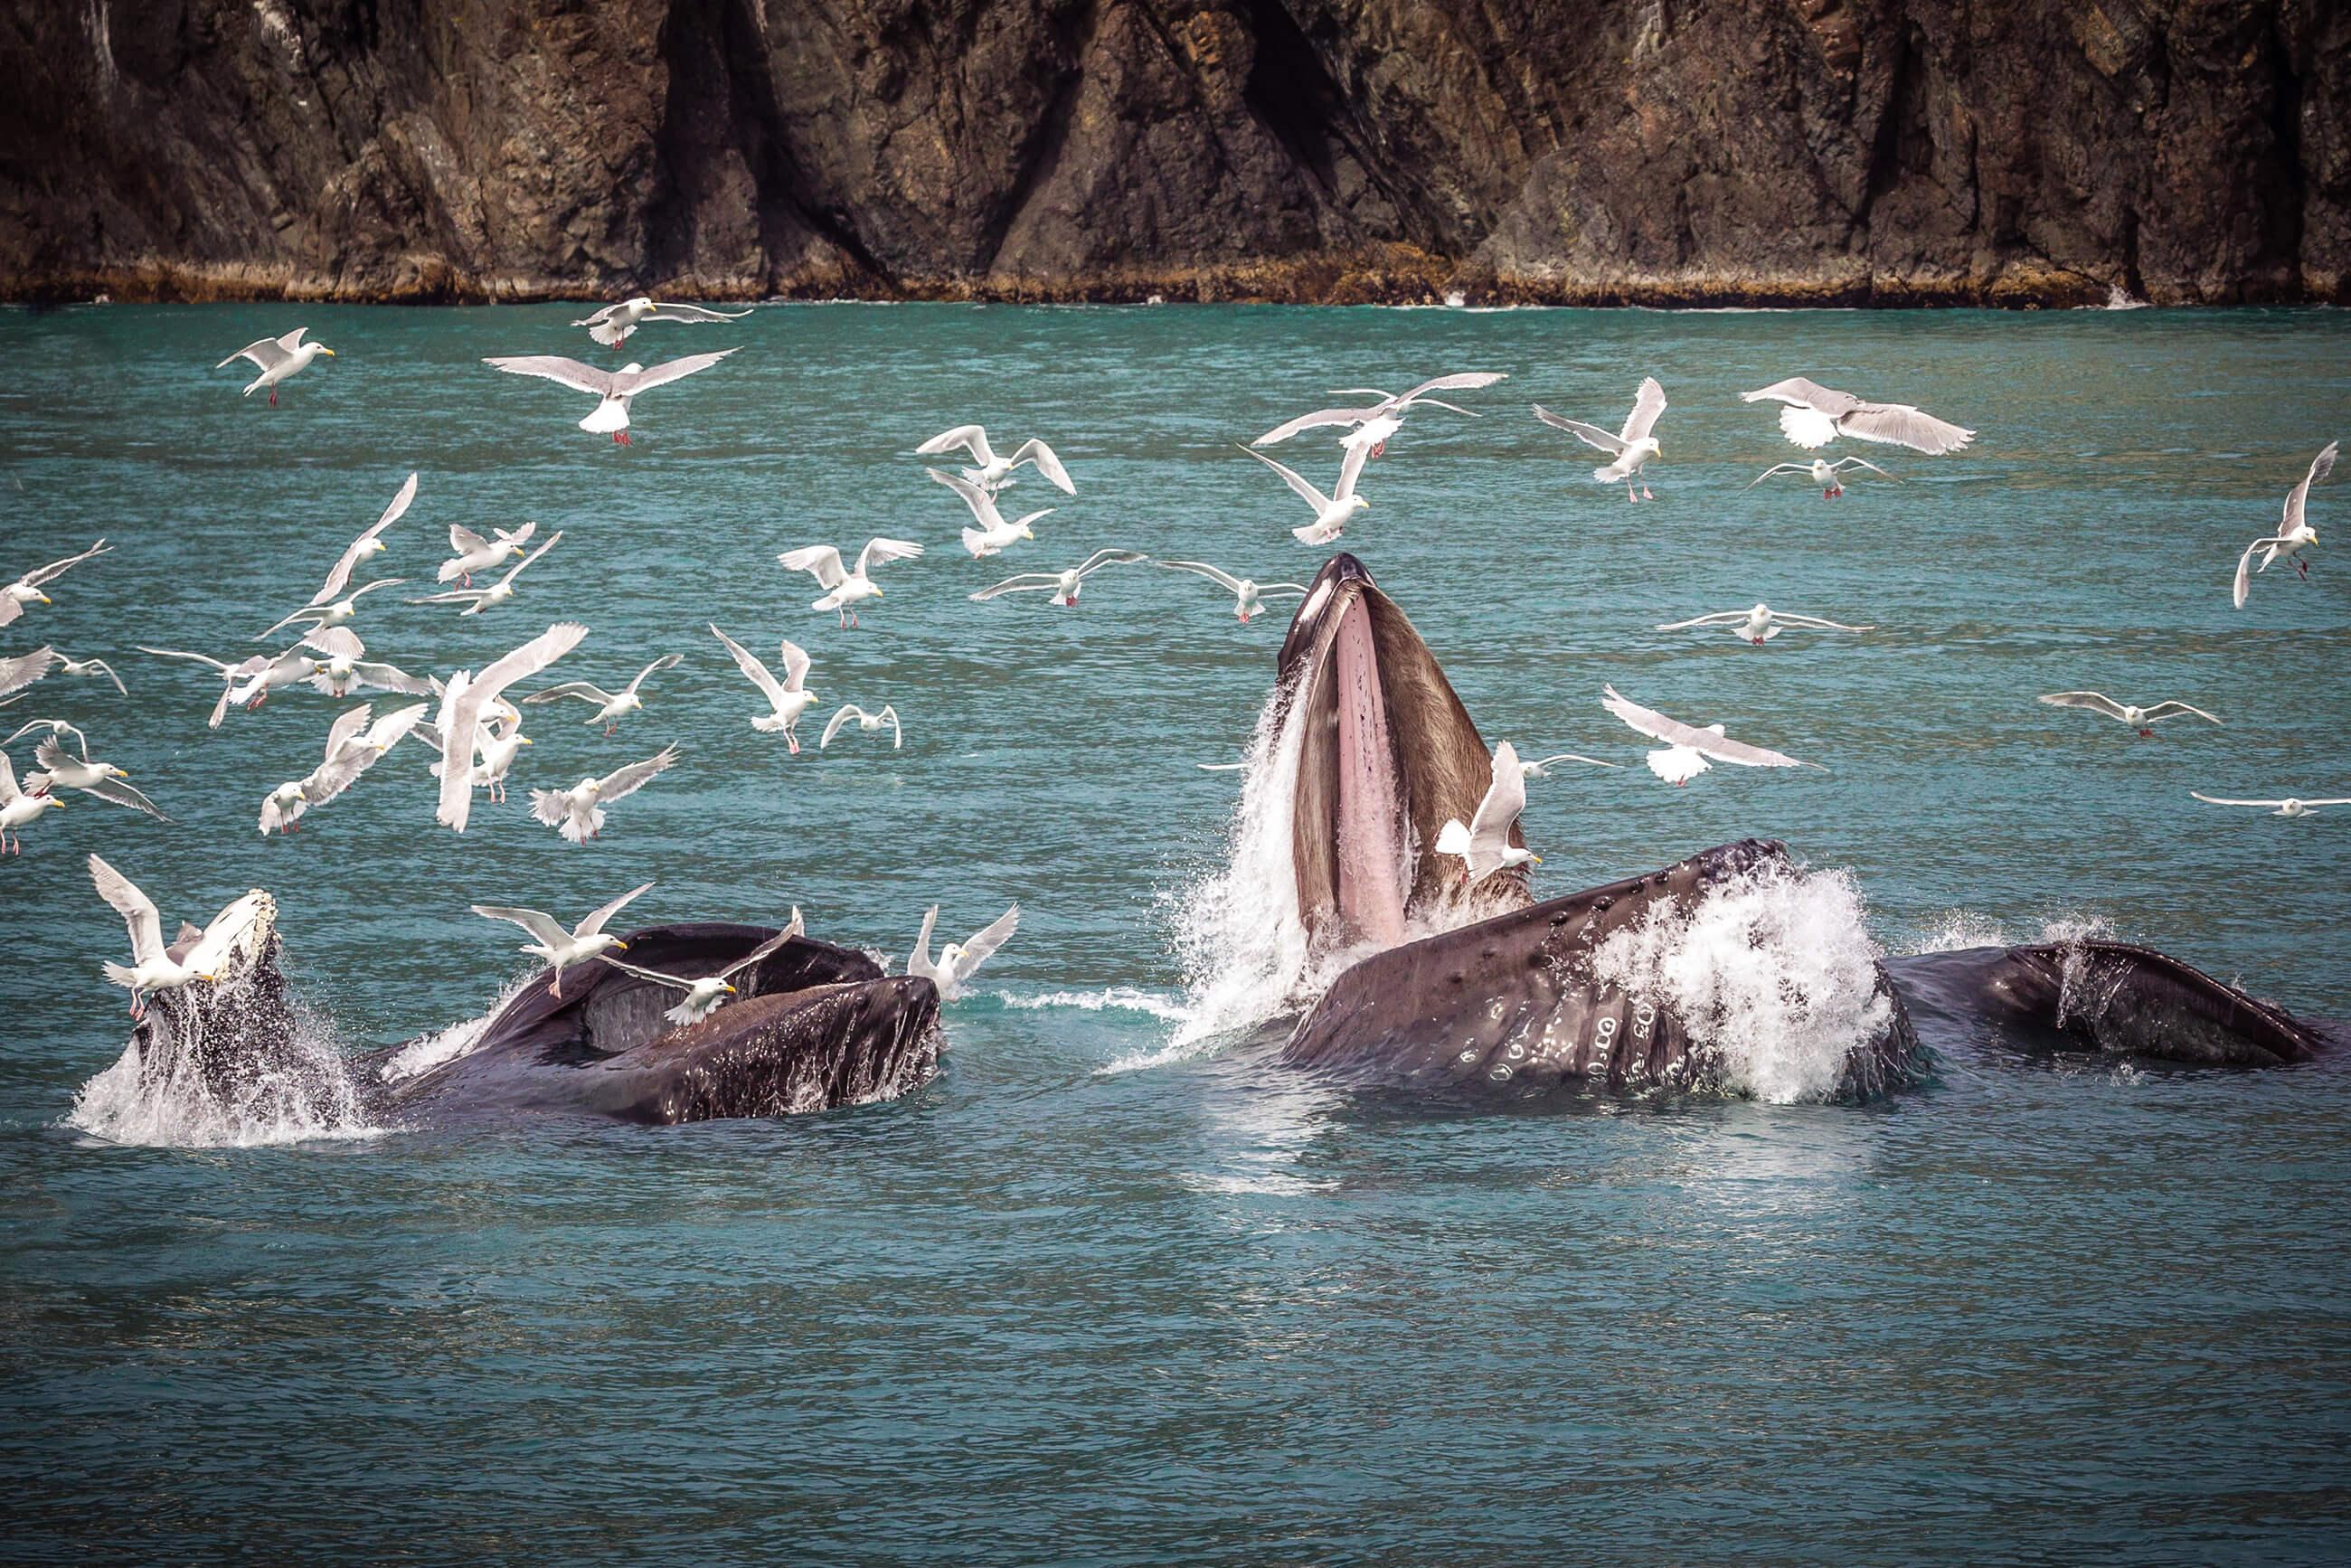 https://bubo.sk/uploads/galleries/16051/pxb_aljaska_humpback-whale-3928551.jpg